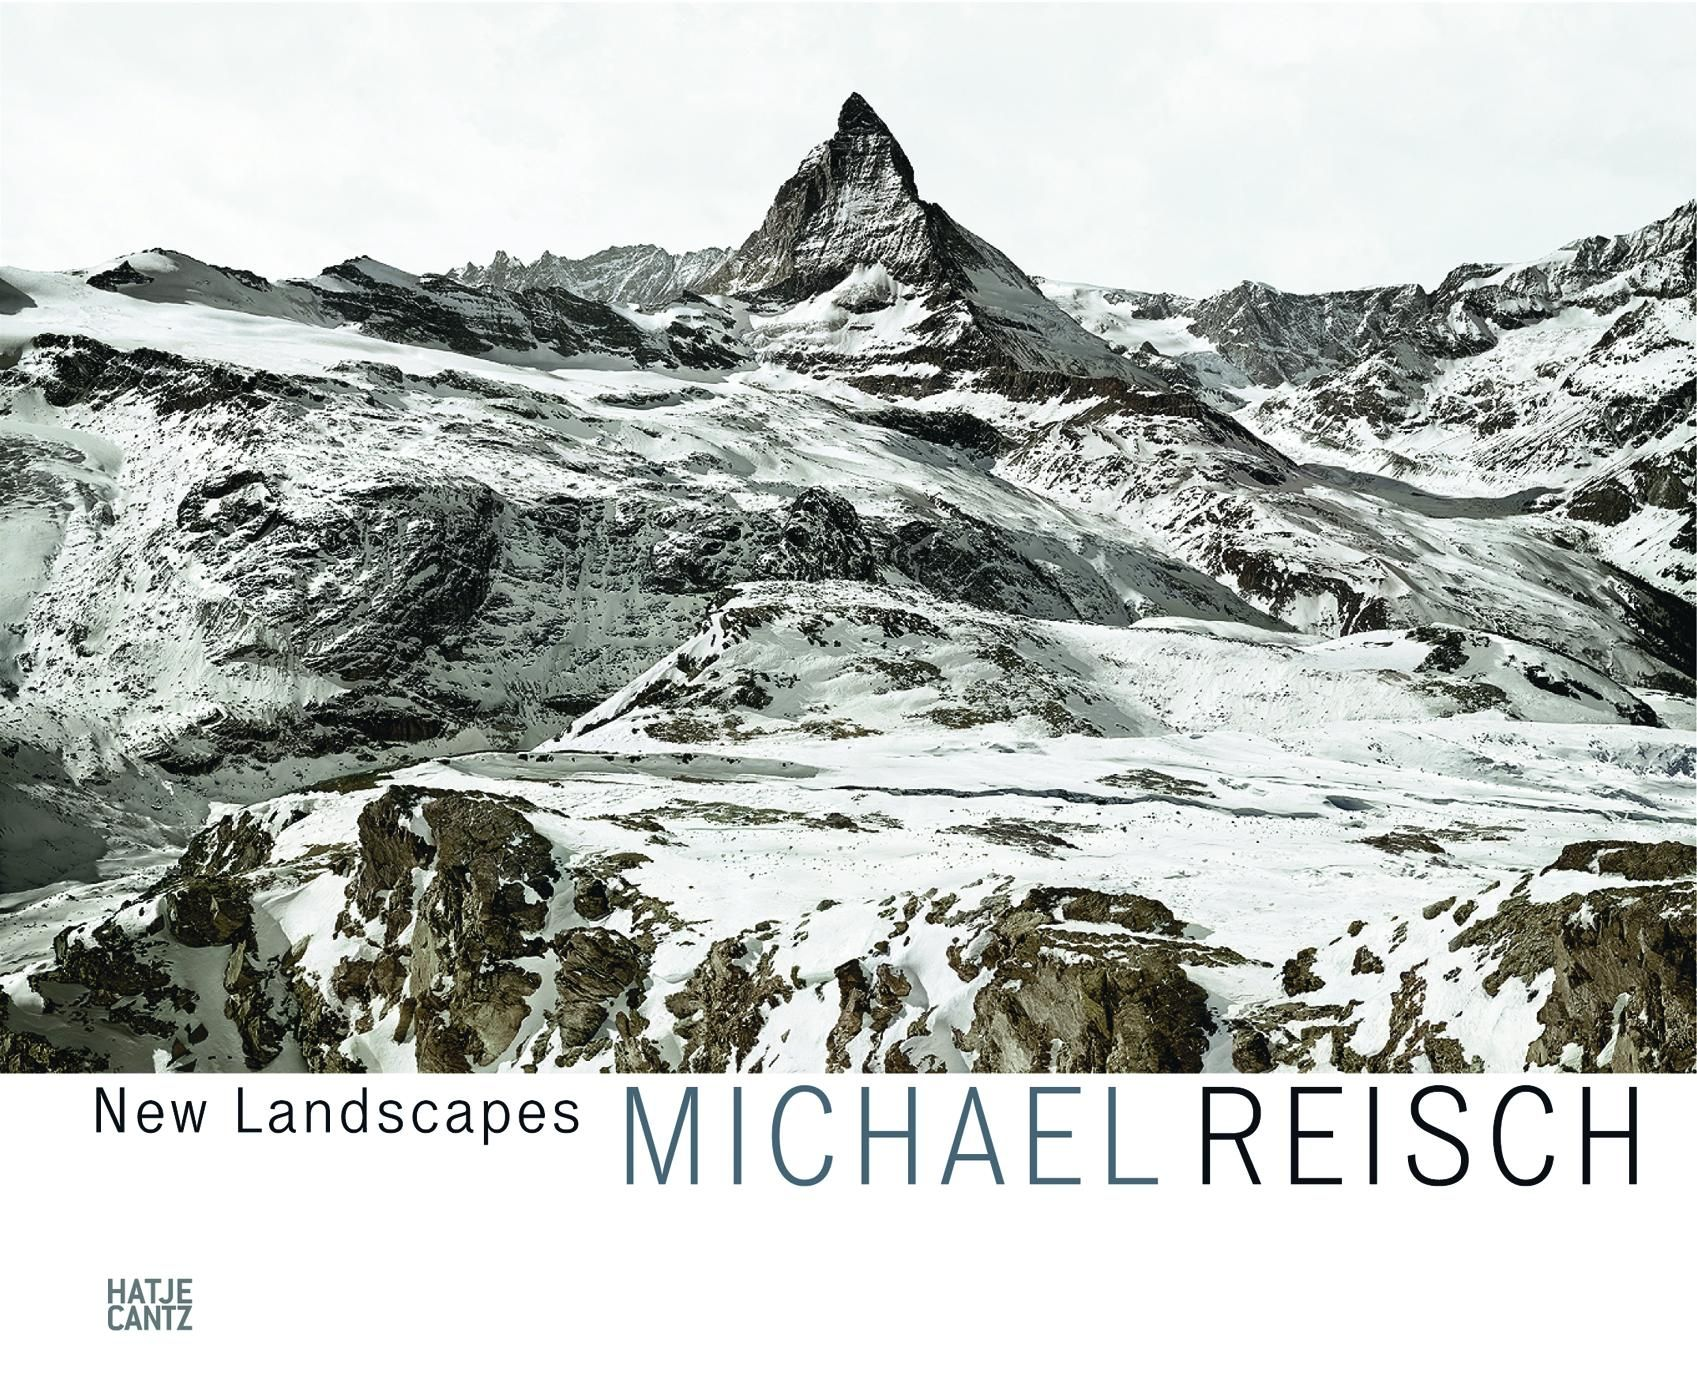 Michael Reisch | Fotografie | Hatje Cantz Verlag